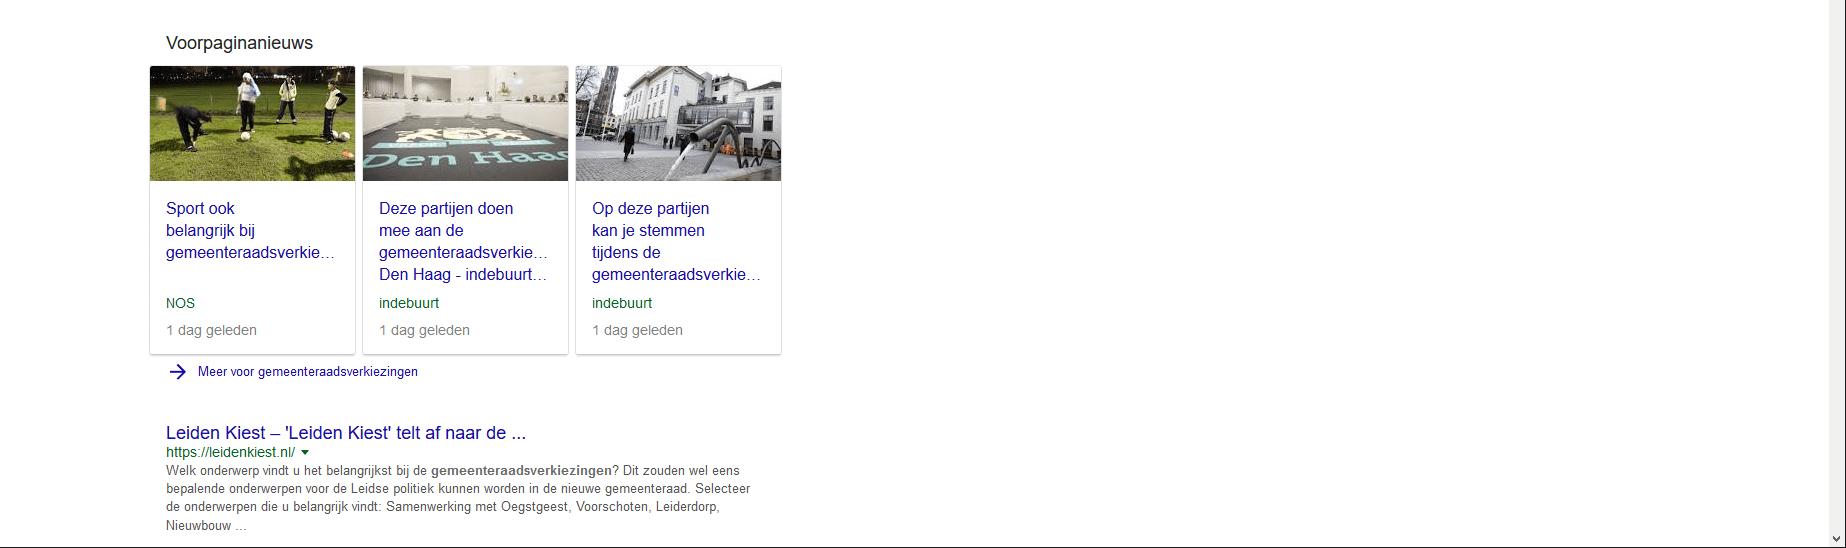 180213 LeidenKiest 3e op Google uitgesneden